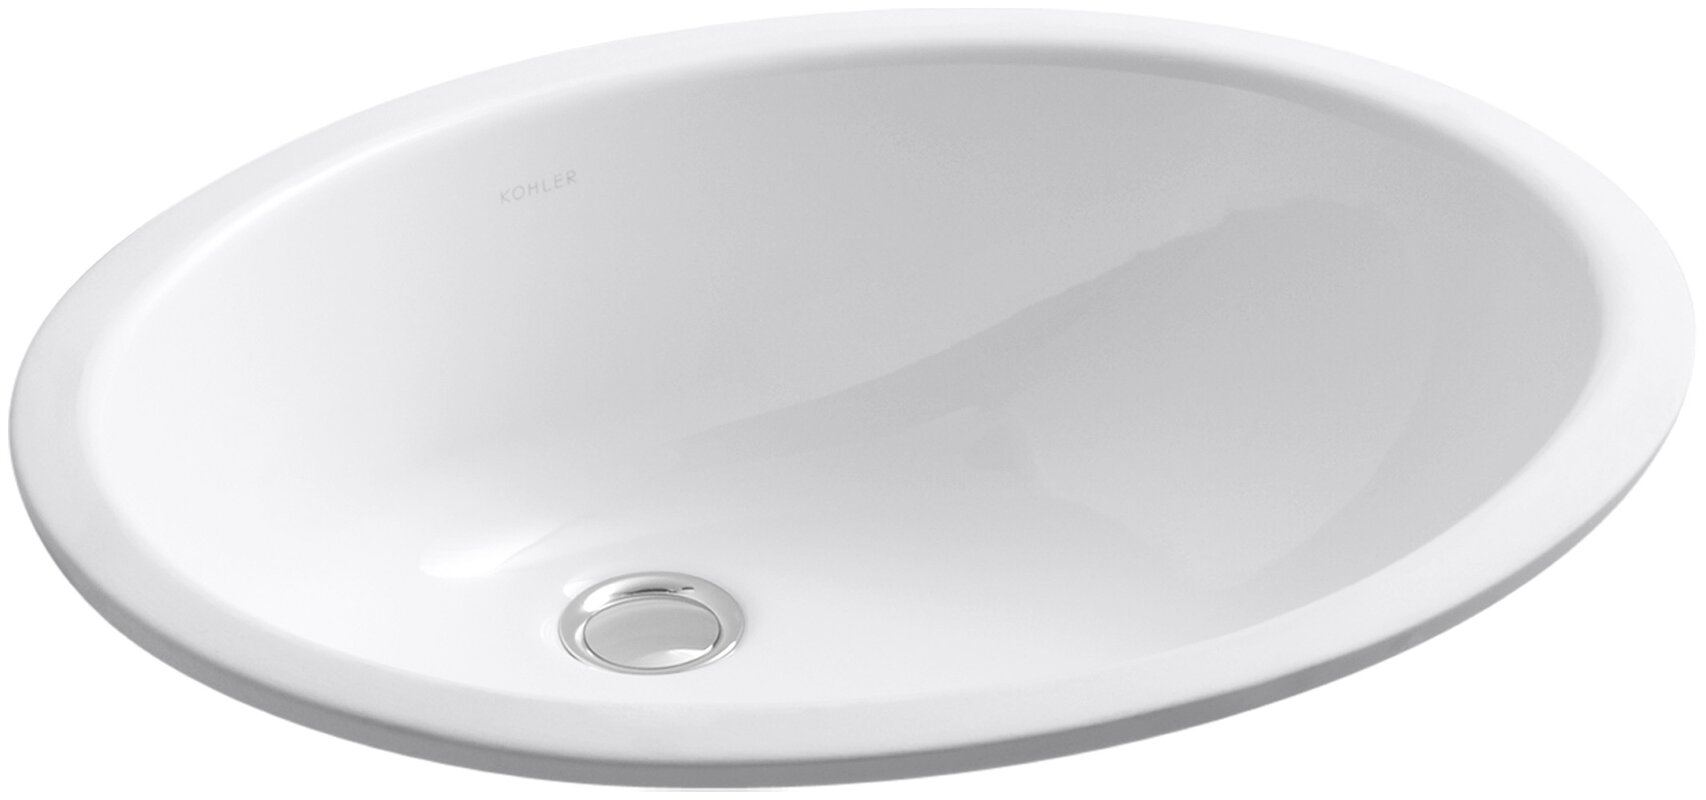 caxton ceramic oval undermount bathroom sink with overflow - Undermount Bathroom Sink Oval